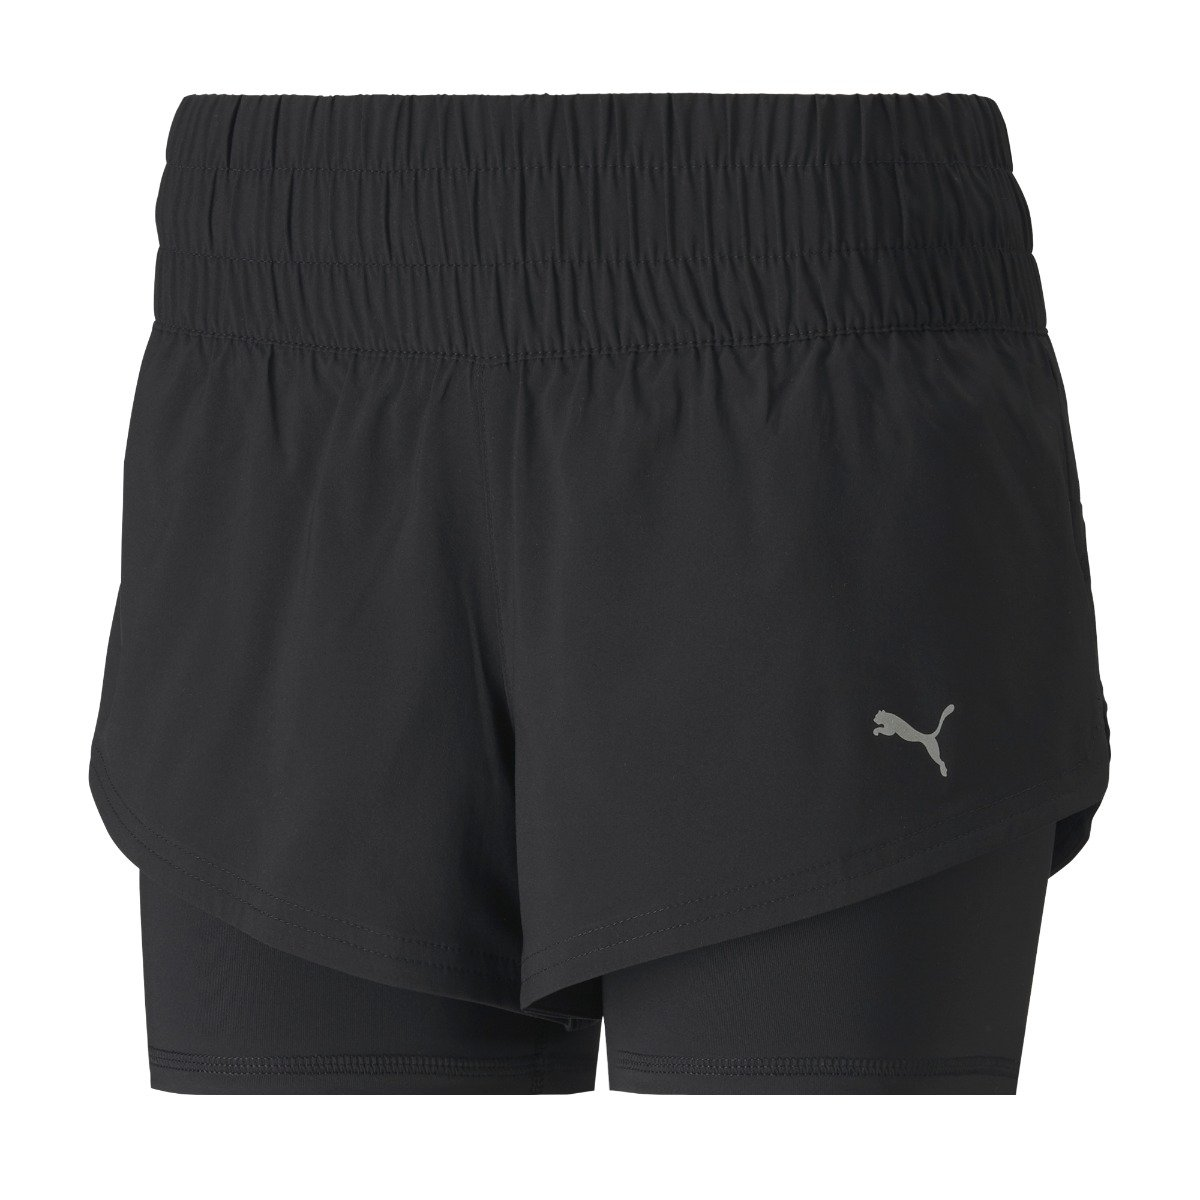 Puma Last Lap 2-in-1 Shorts dame